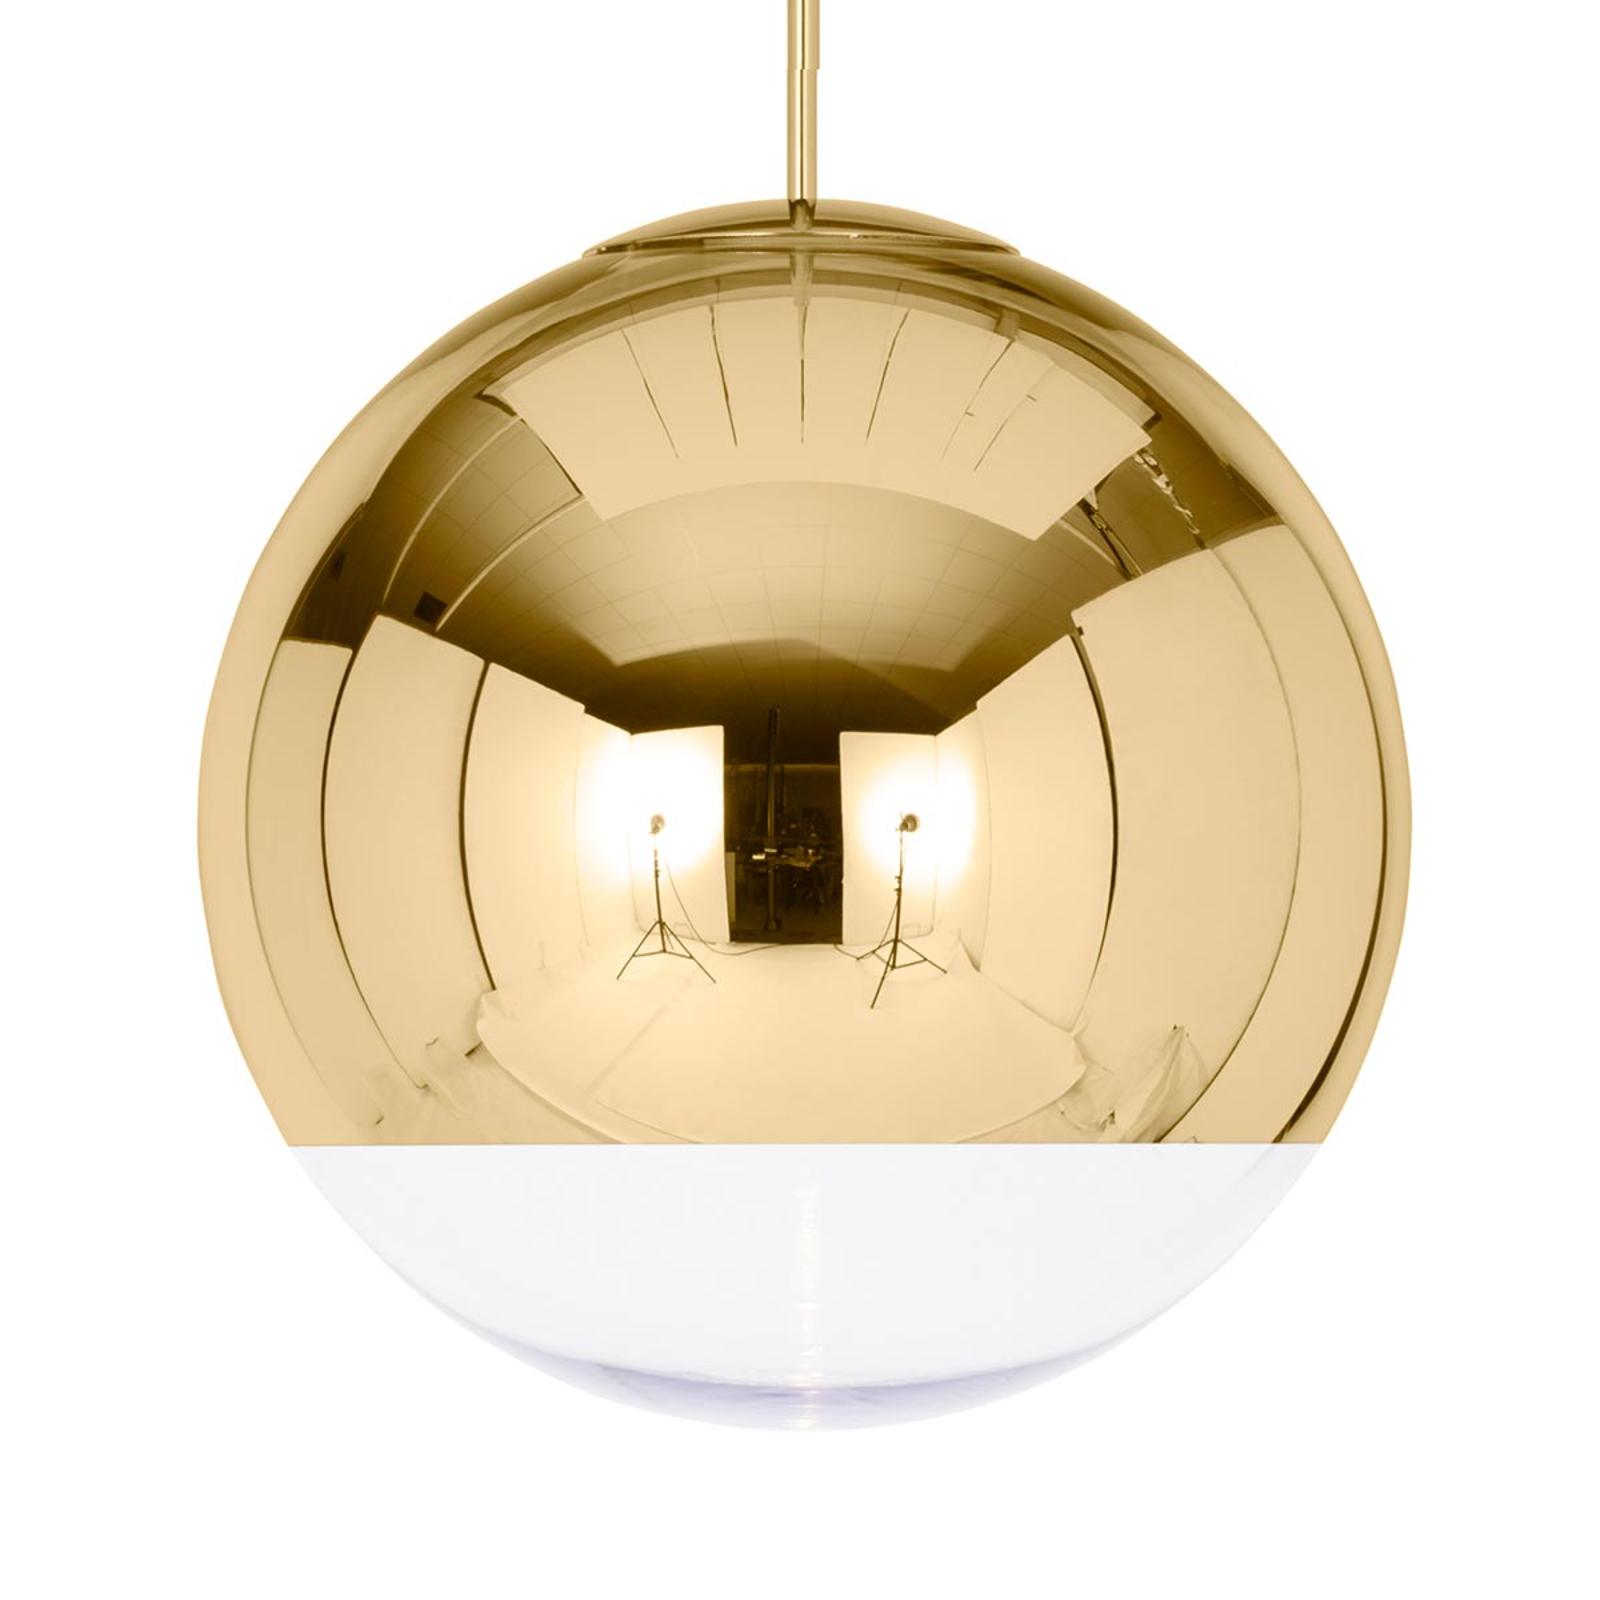 Lampada sosp dorata lucida Mirror Ball 50 cm